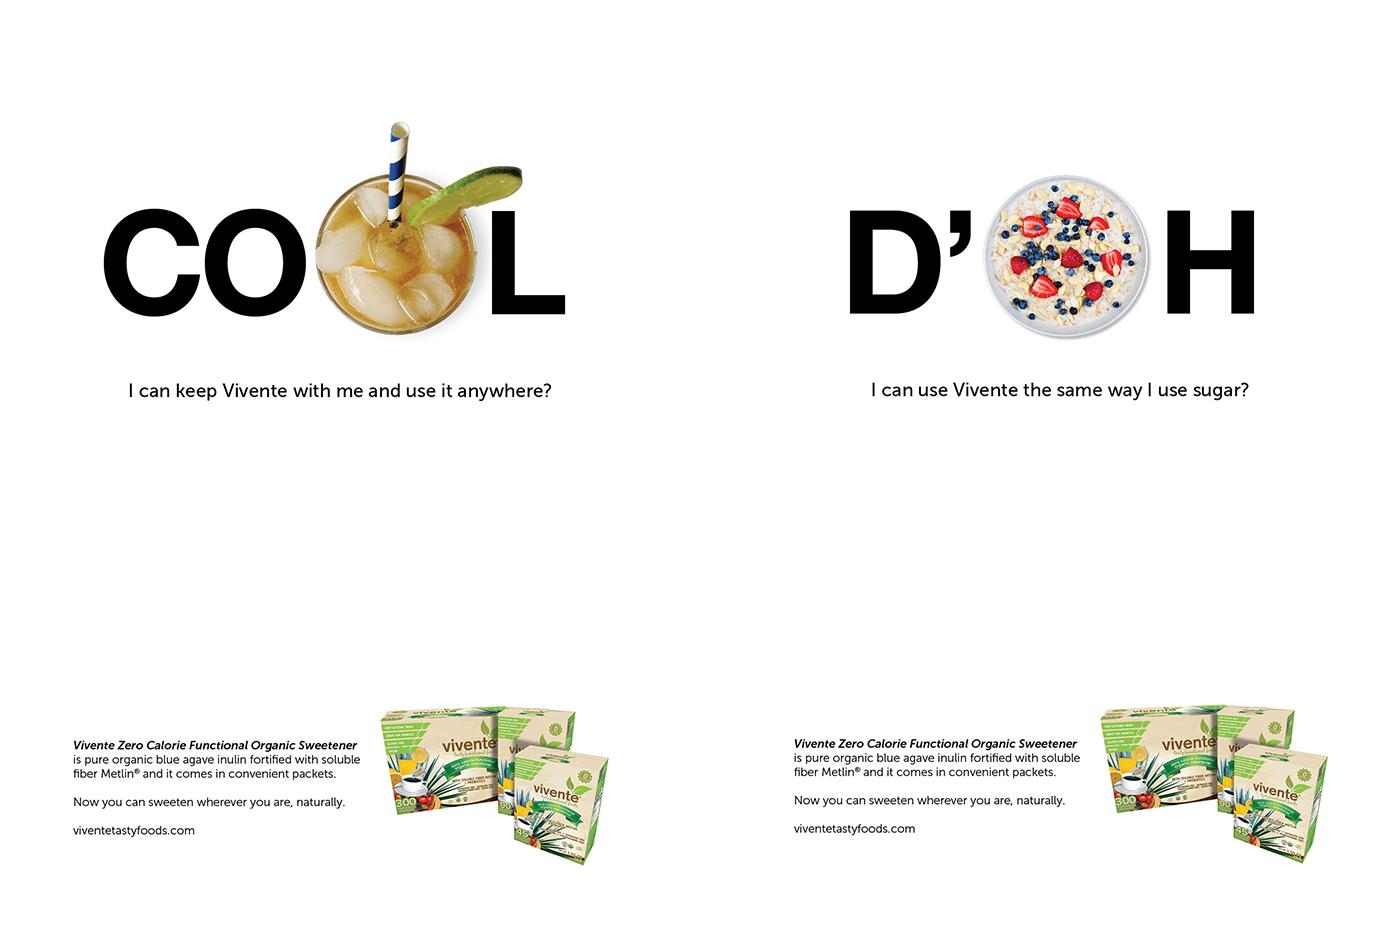 sweetener-ads-02